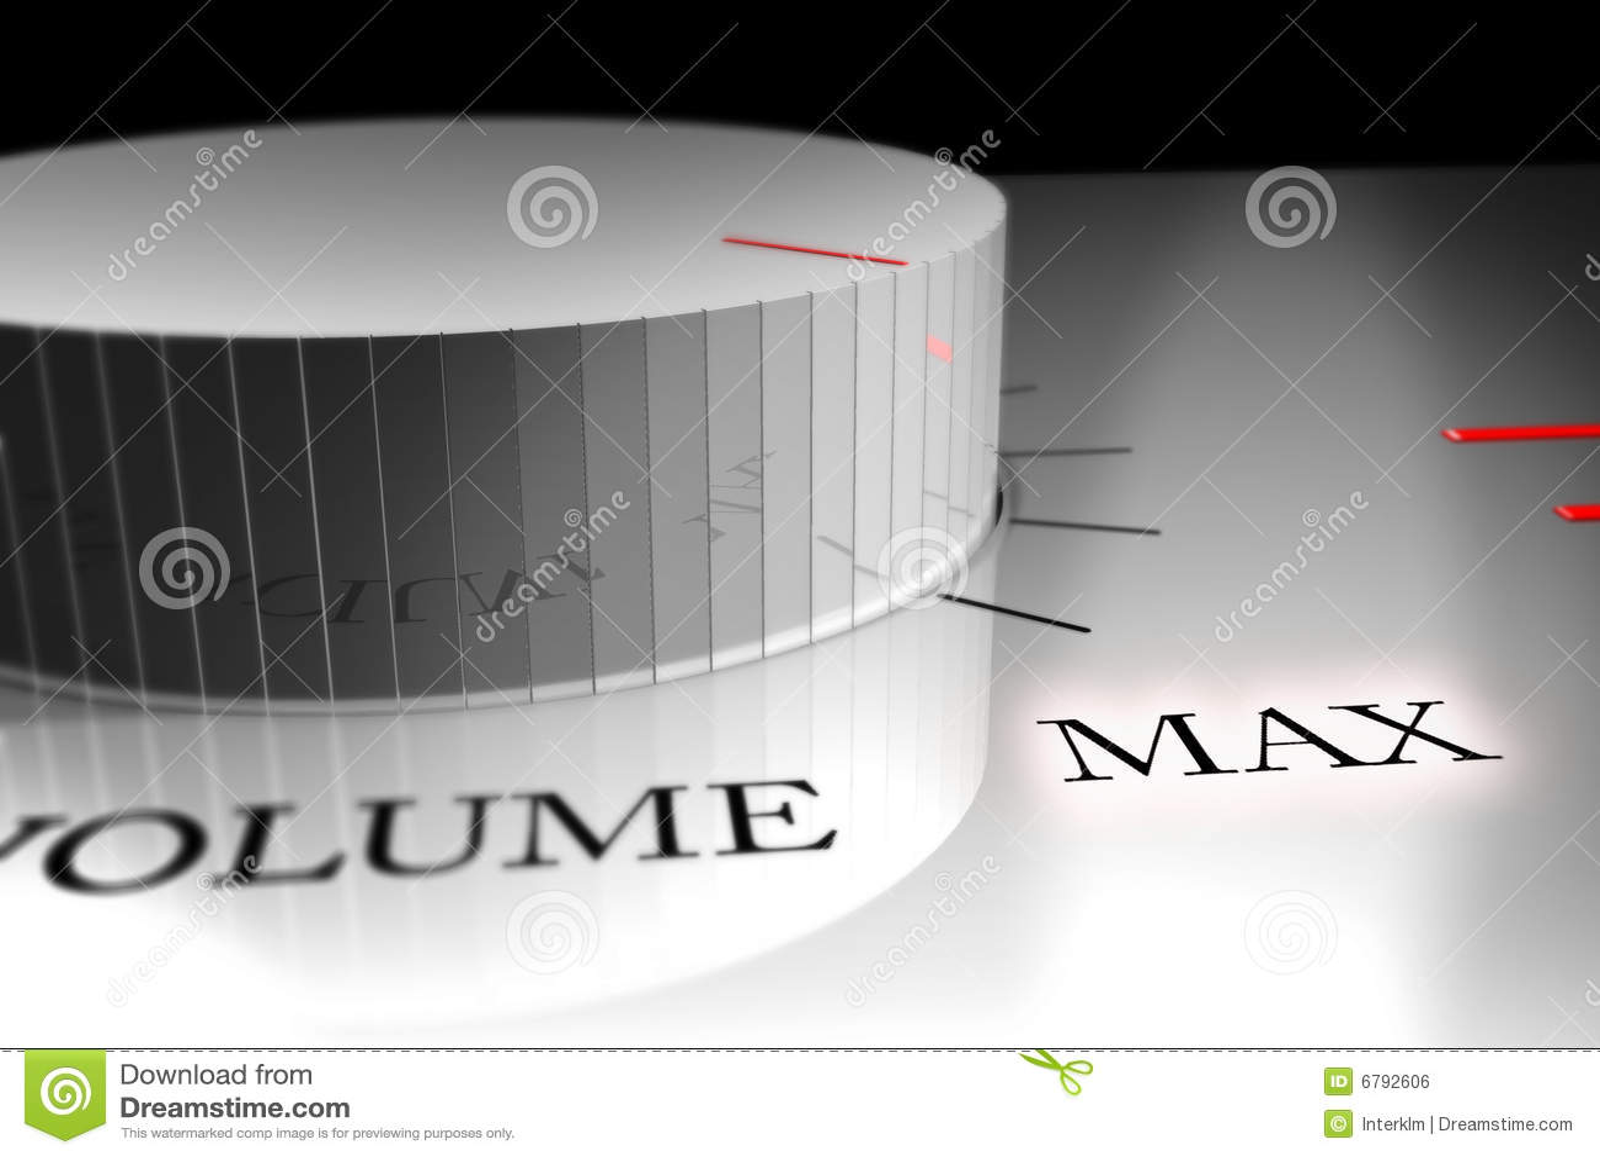 Volume Max stock photo. Image of metal, dimension, lamp ...